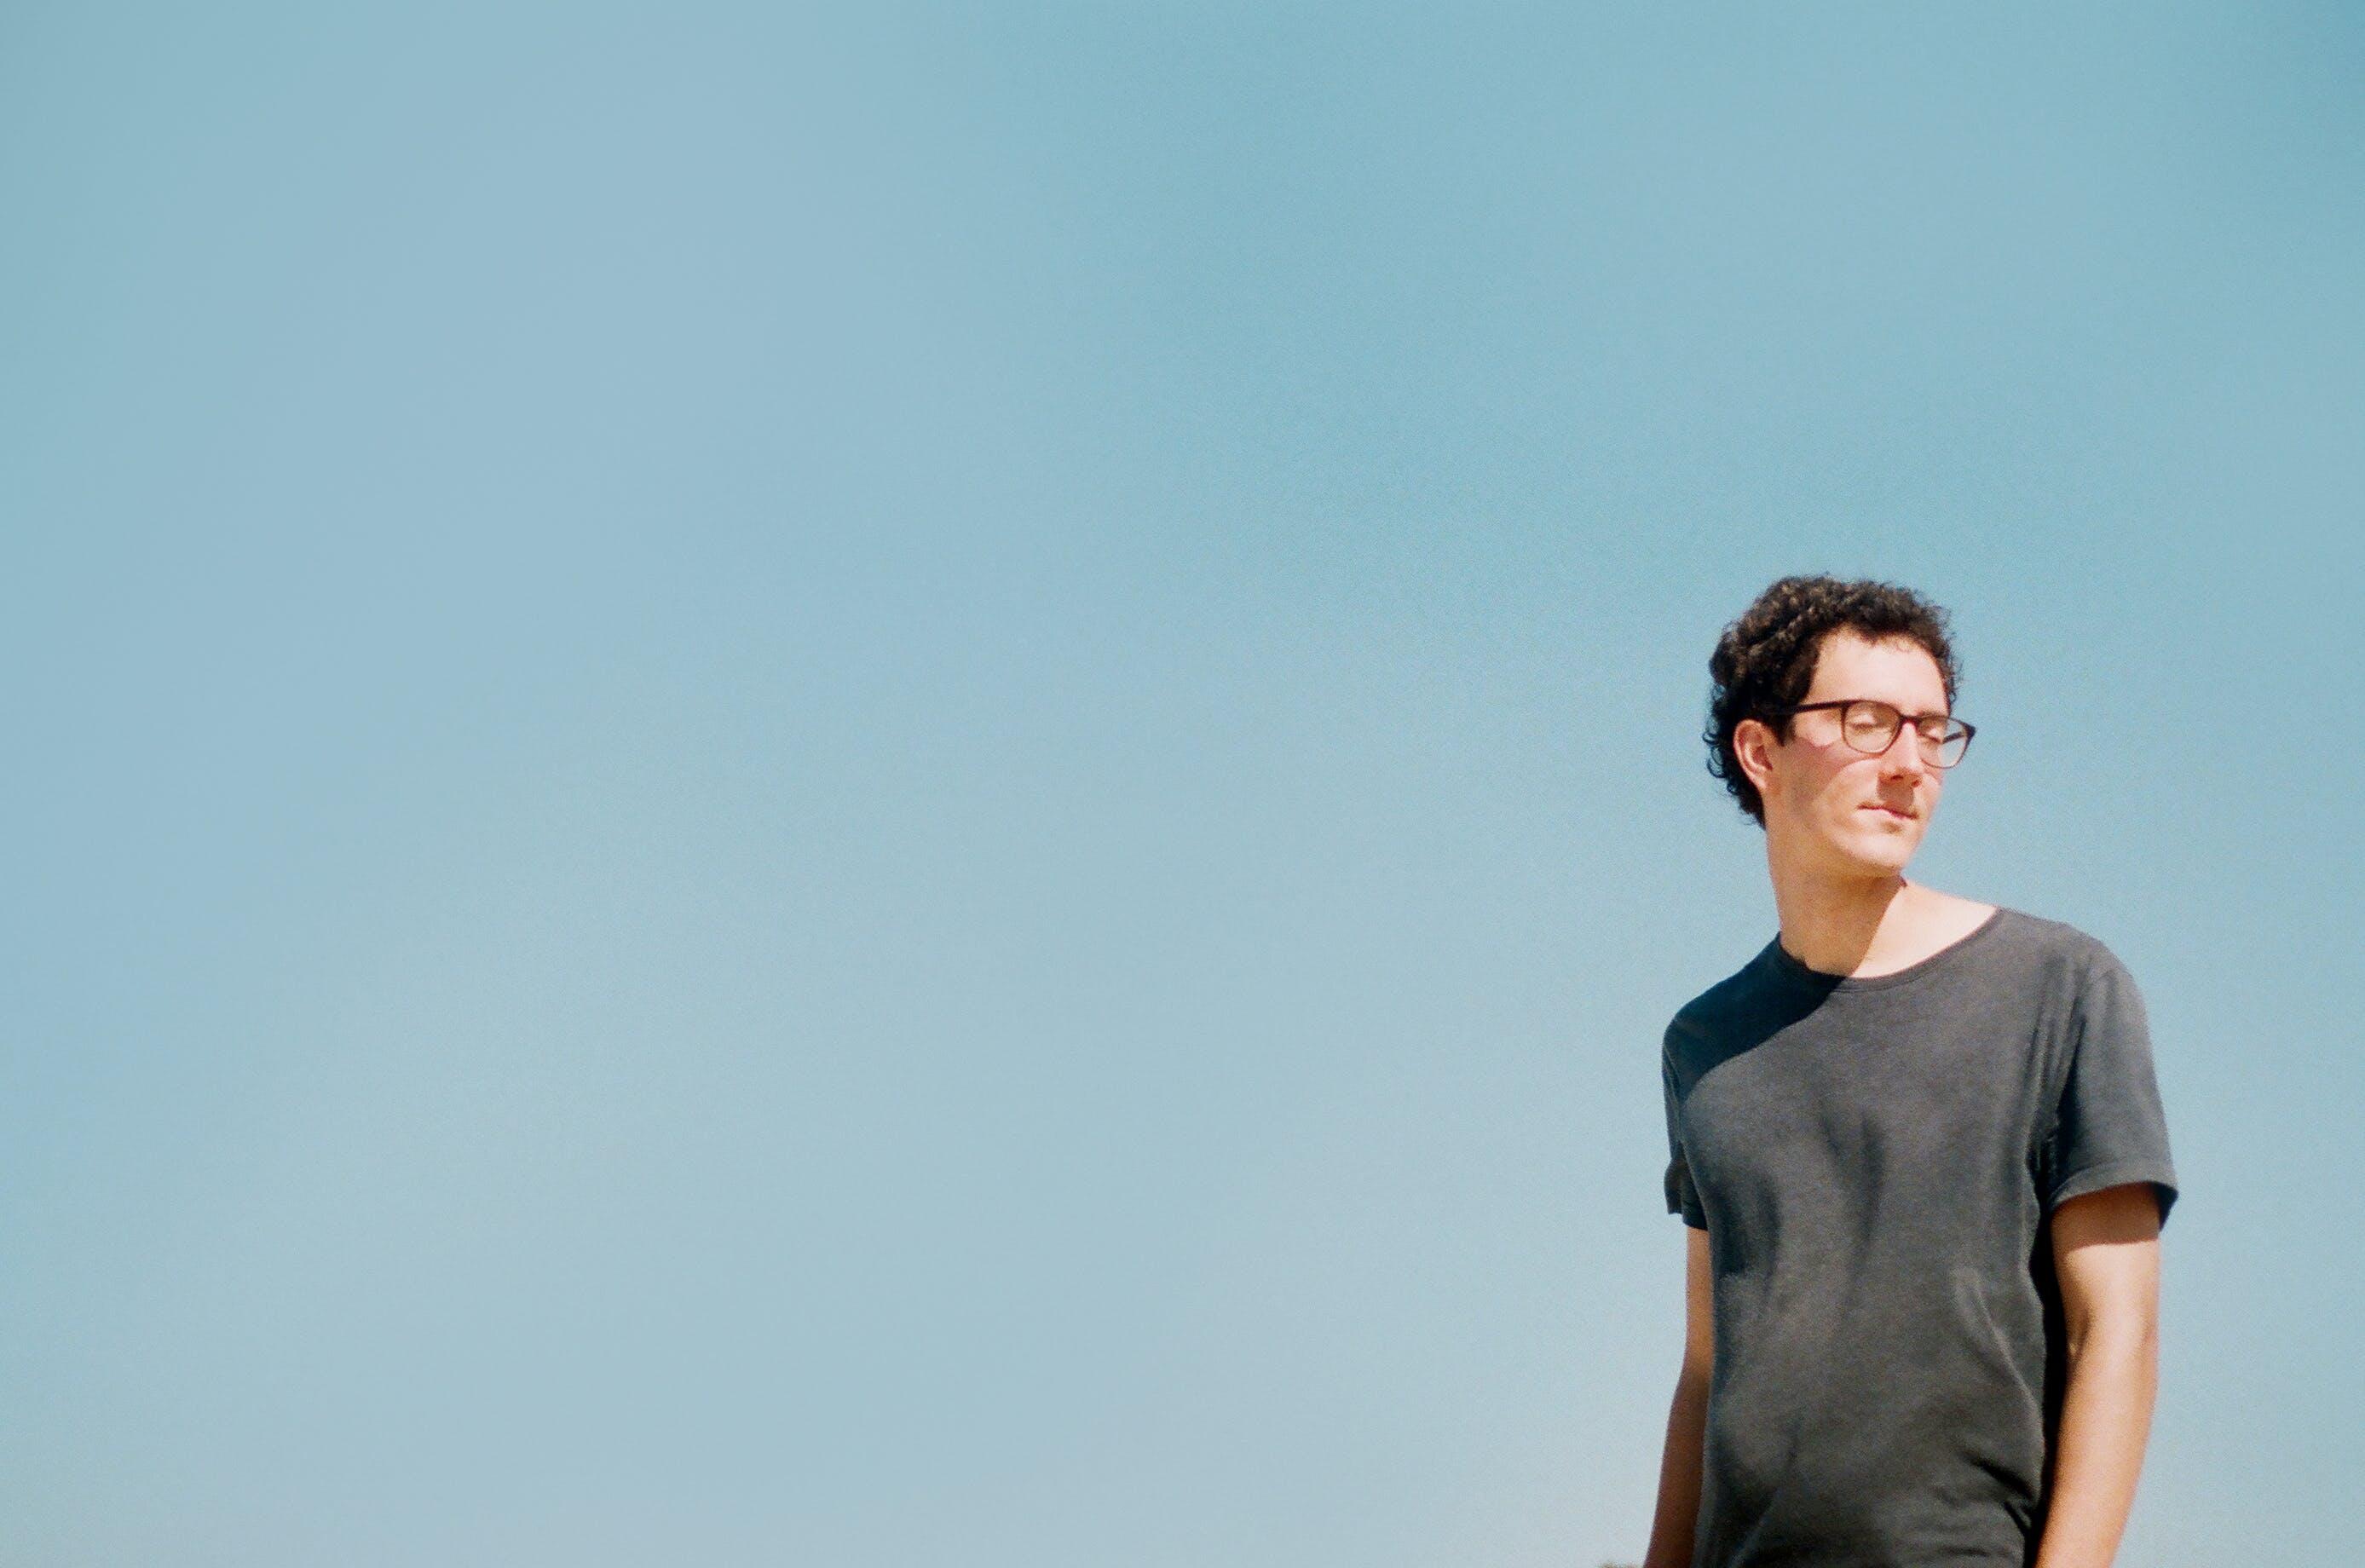 Man Standing Under Blue Sky